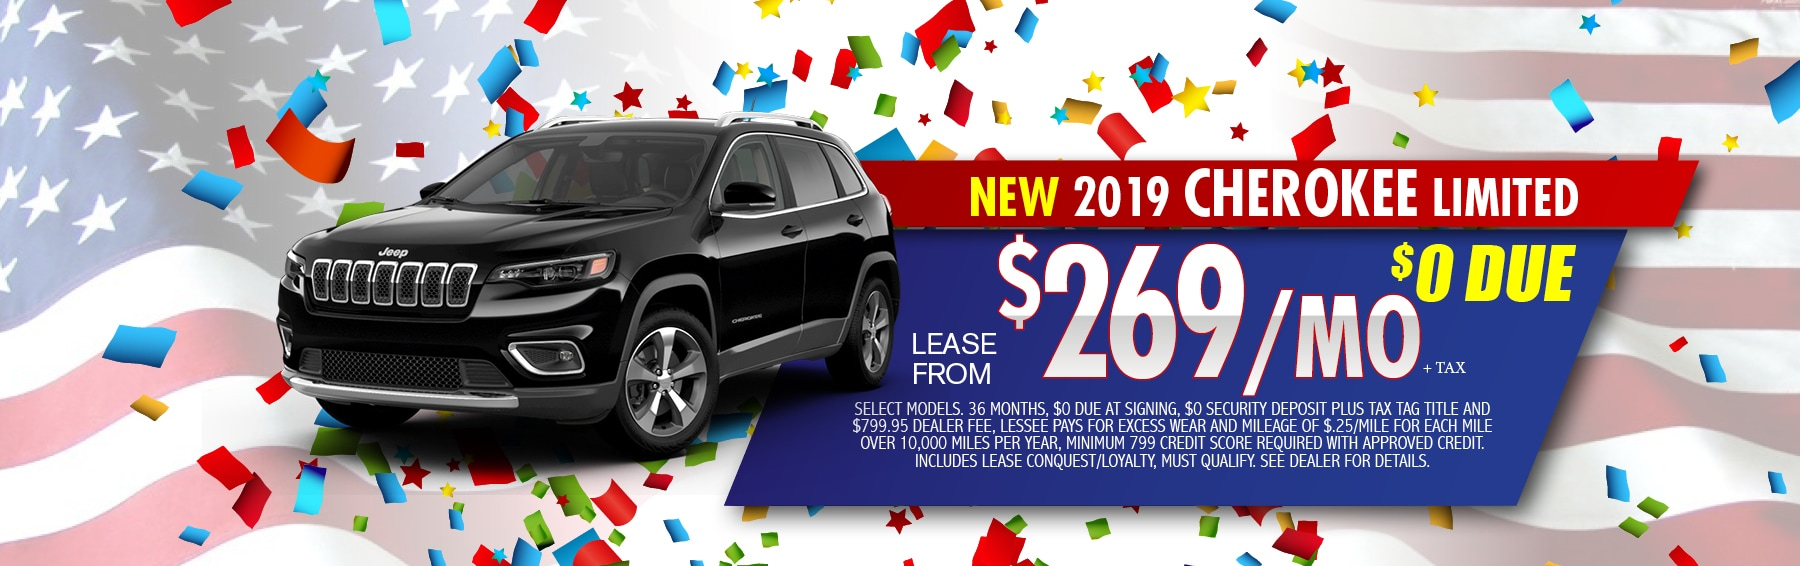 BMW Fort Pierce >> Arrigo Ft Pierce | Chrysler Dodge Jeep RAM FIAT Dealer | Fort Pierce, FL